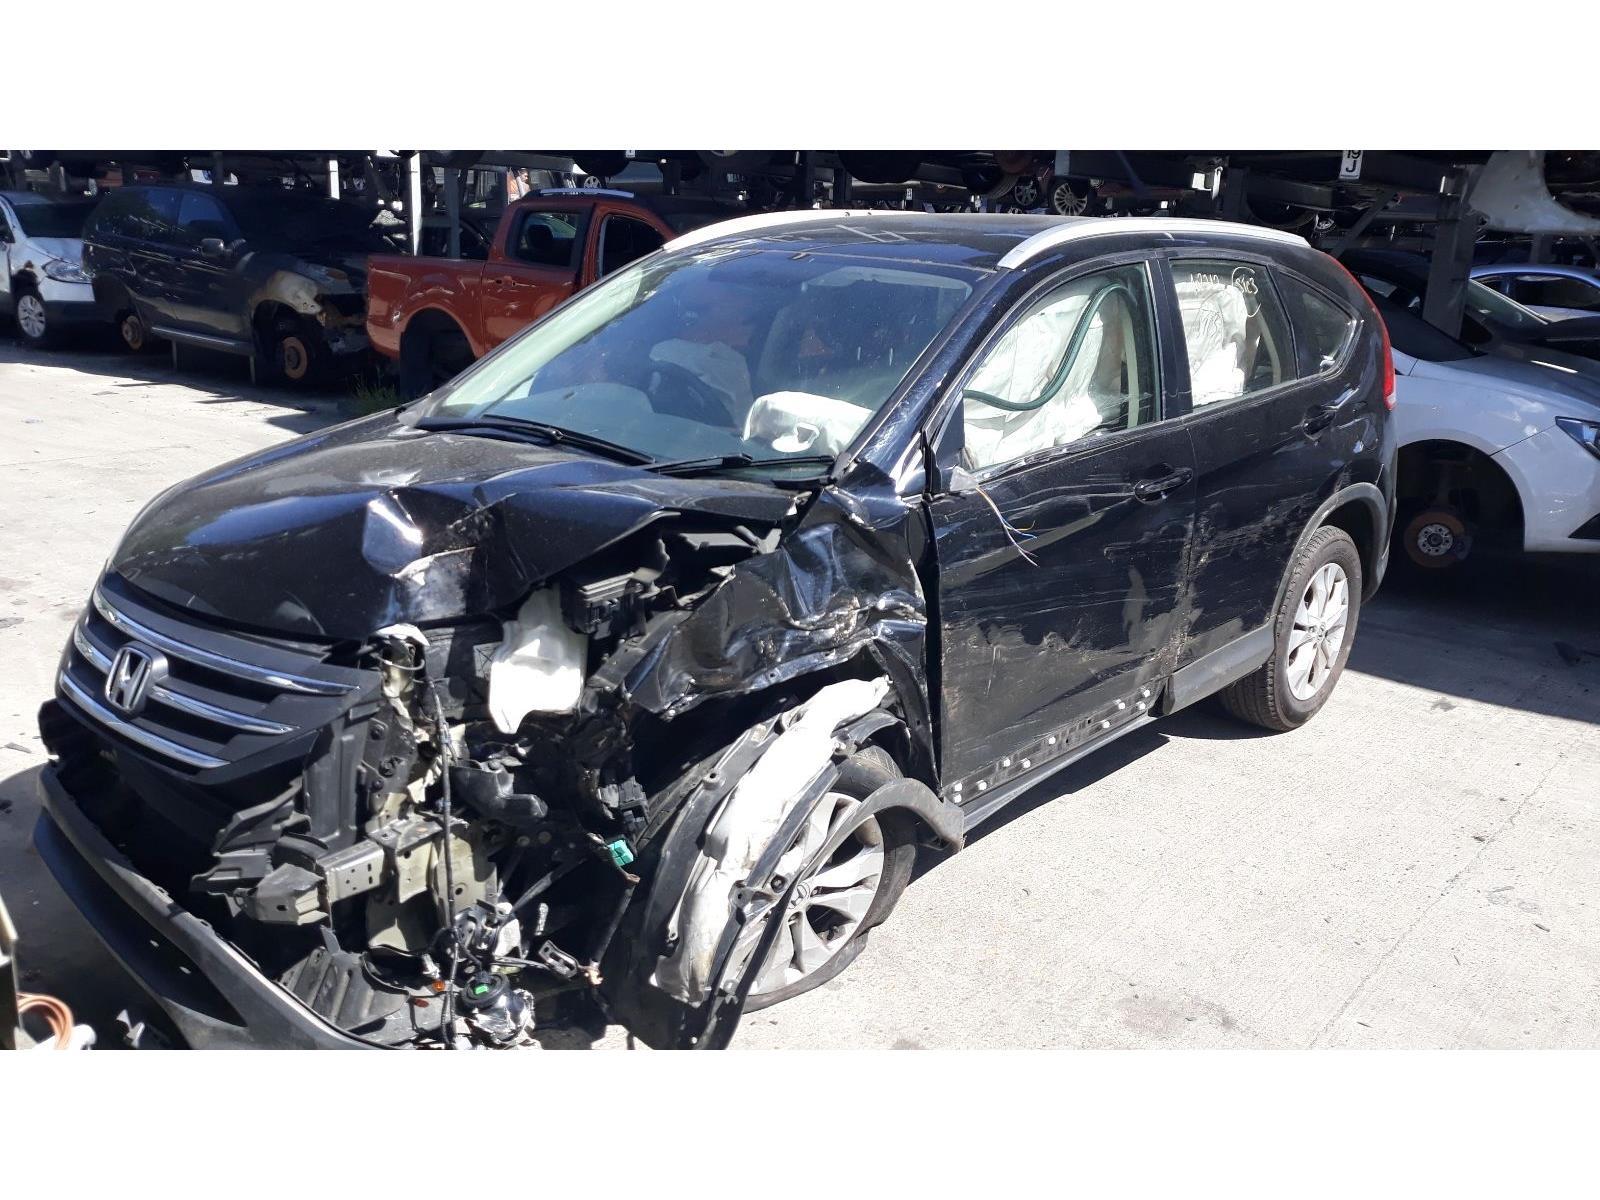 Honda Cr V 2012 To 2015 S T I Dtec 5 Door Estate Scrap Salvage 2003 Rear Suspension Parts Diagram Further 1997